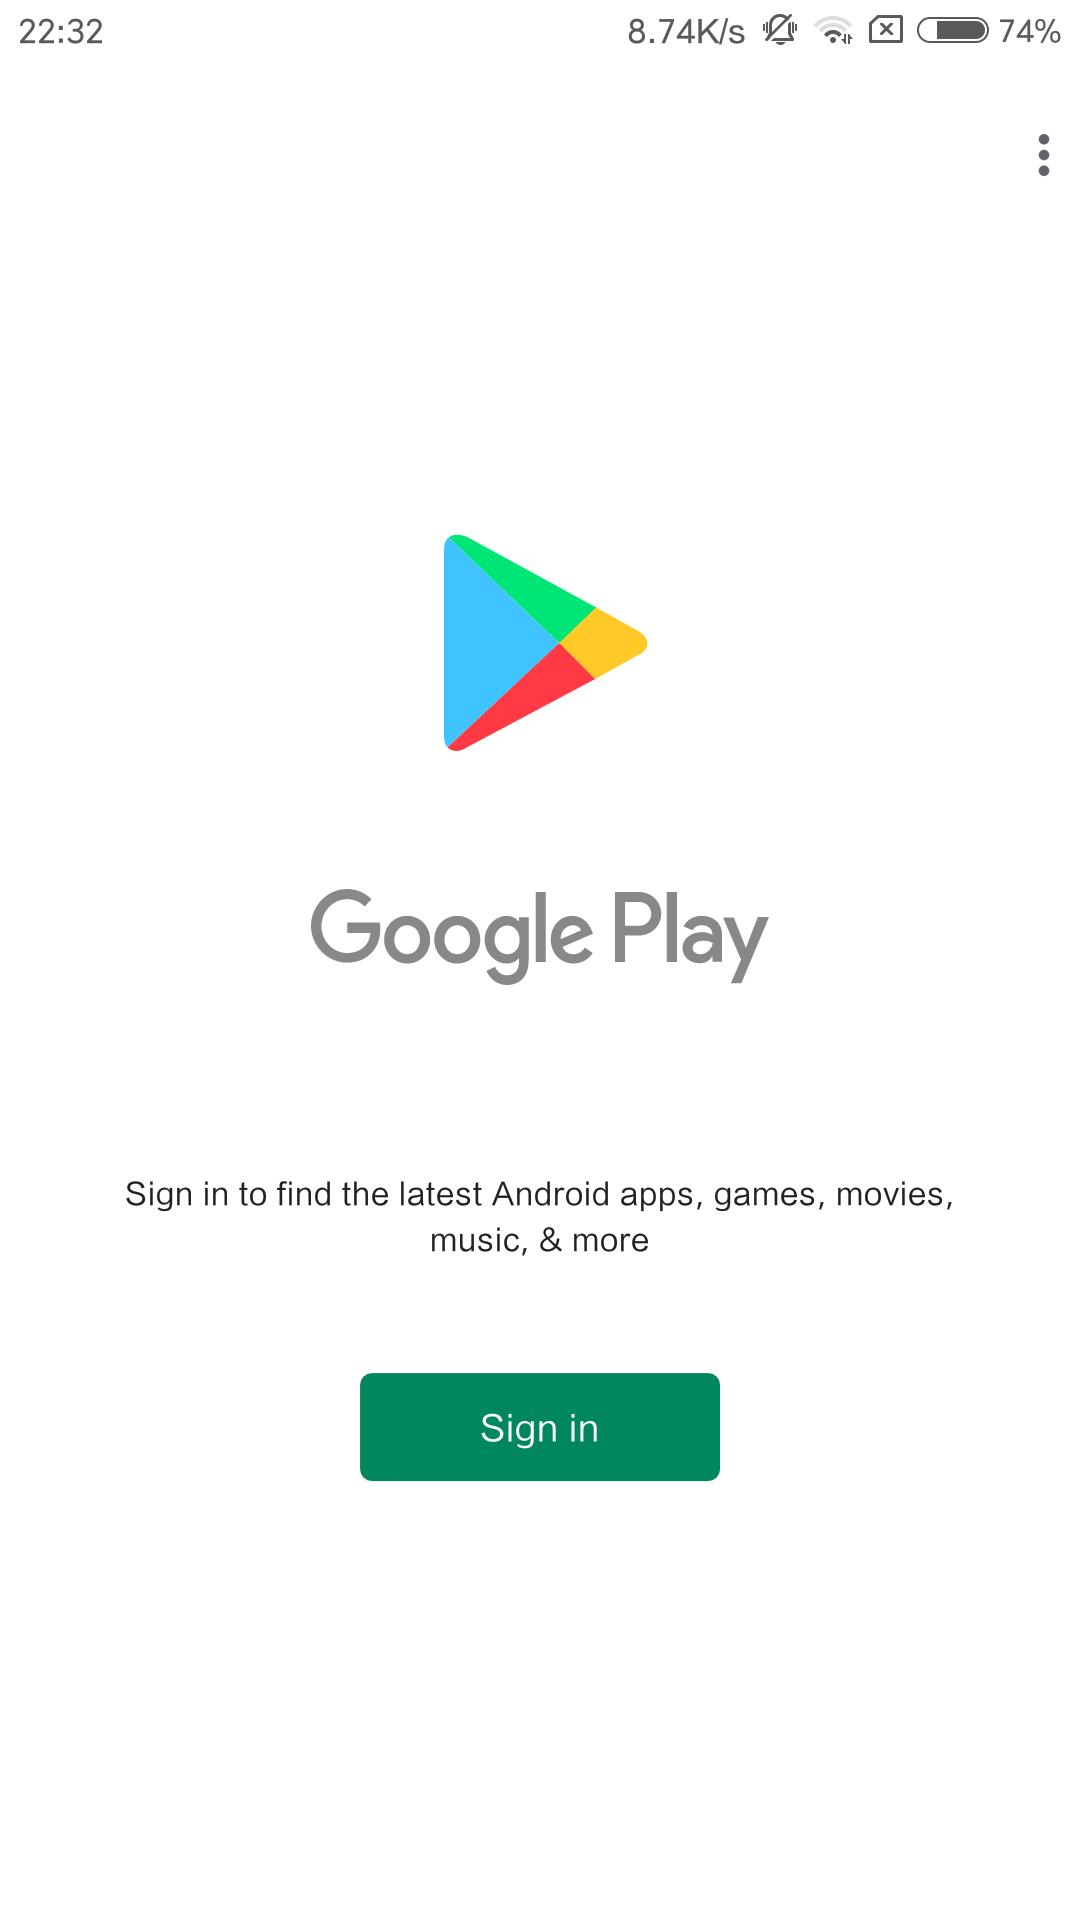 Screenshot_2021-07-10-22-32-43-821_com.android.vending.png